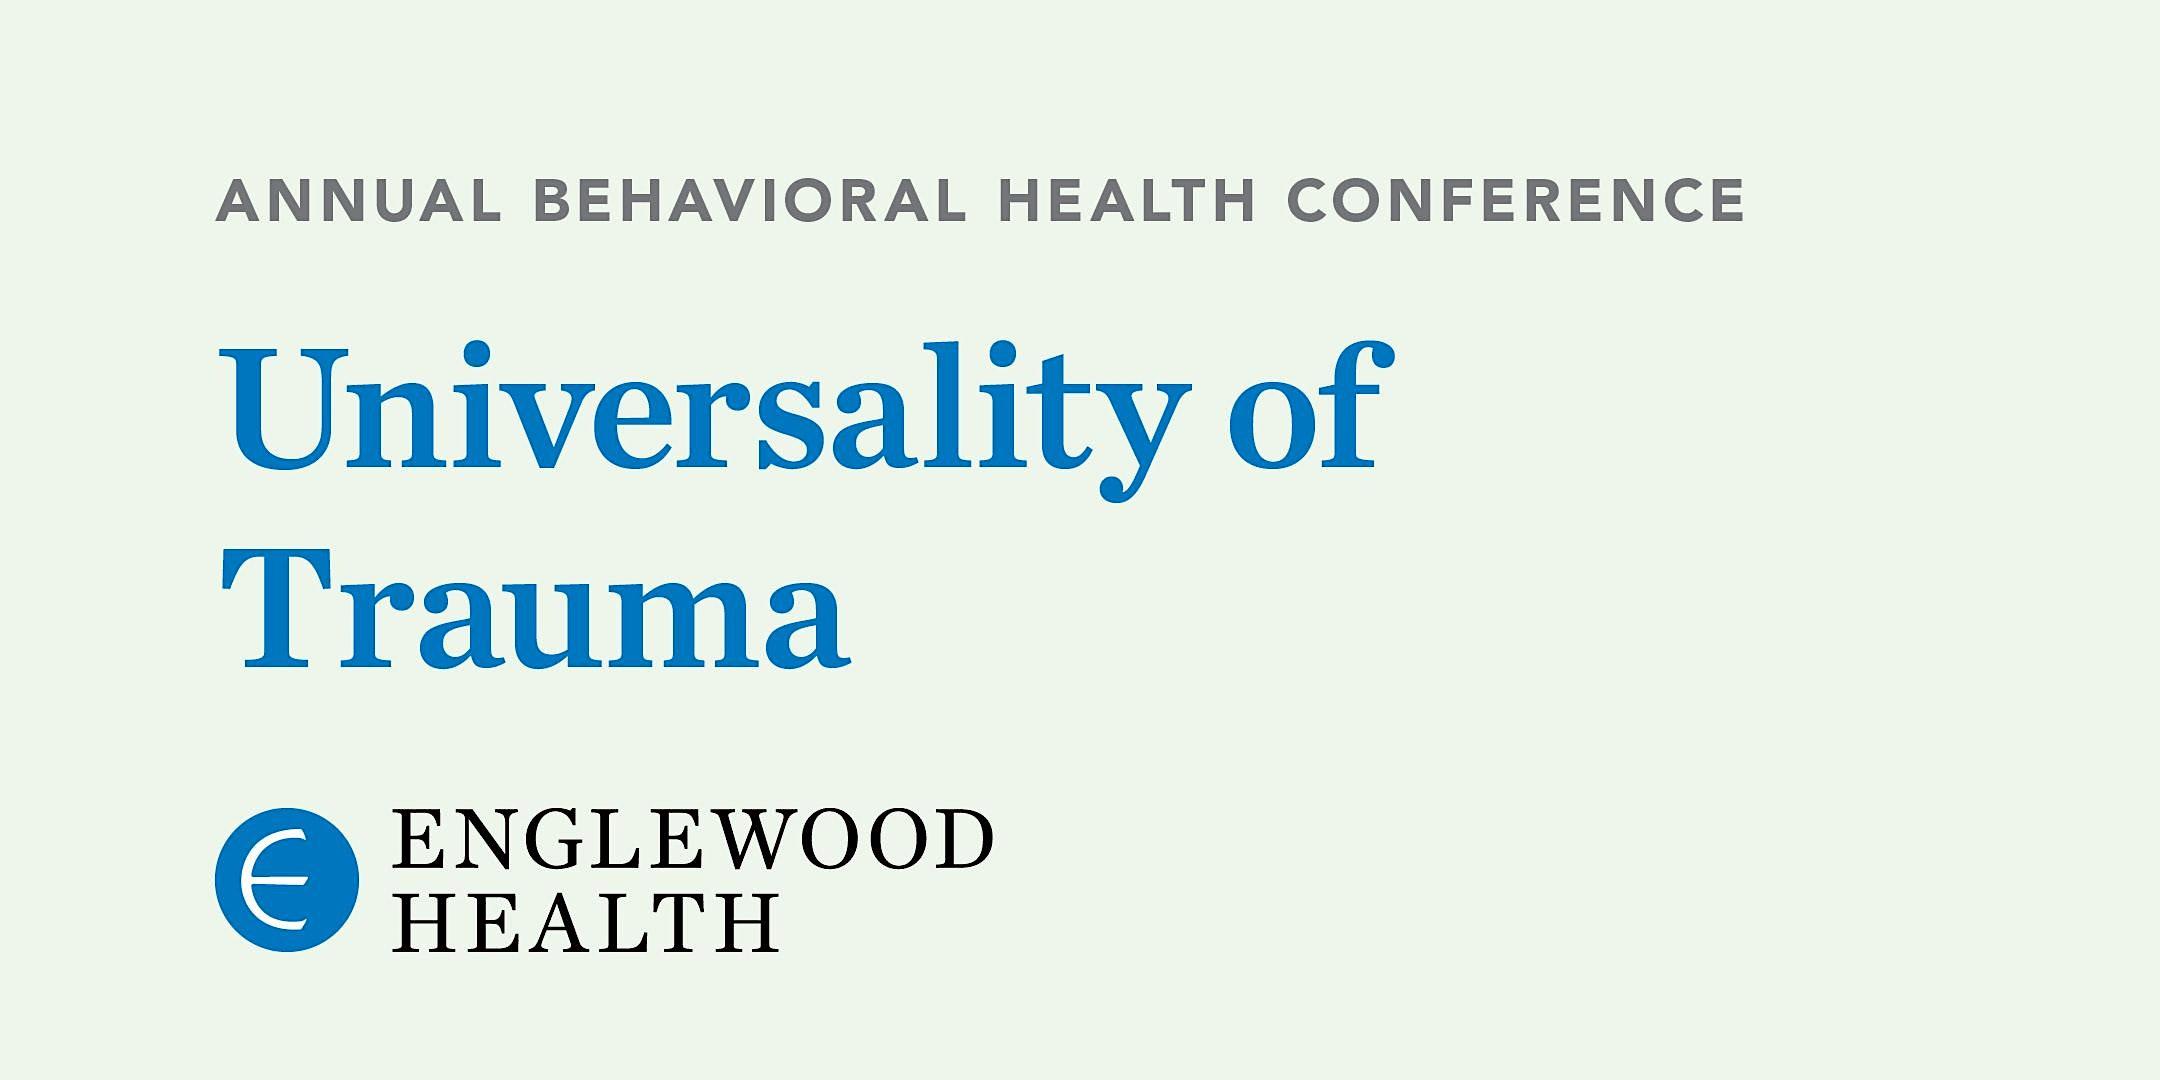 More info: Virtual Annual Behavioral Health Conference 2021: Universality of Trauma